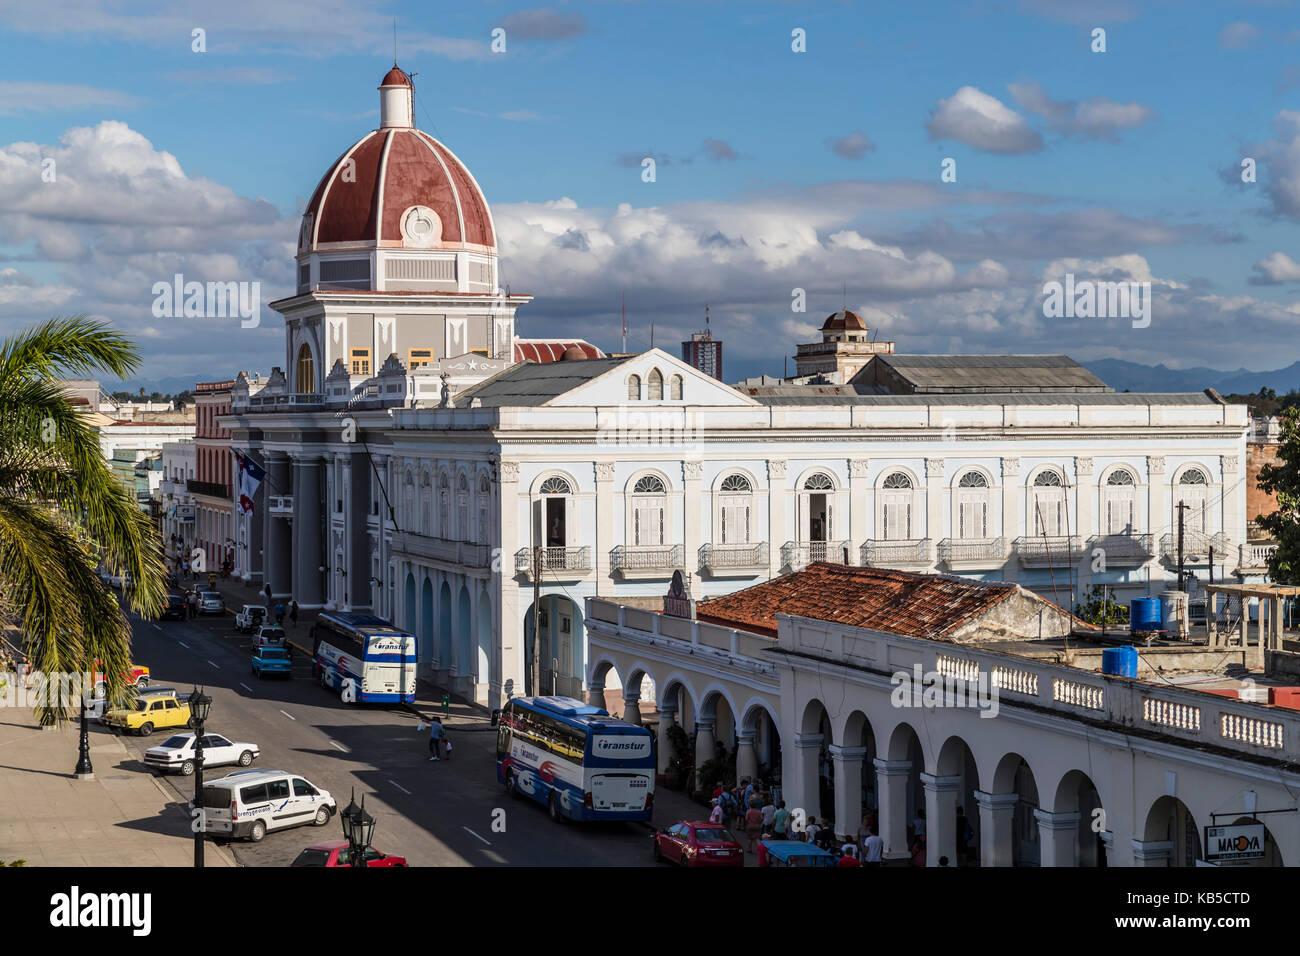 The rotunda of the Antiguo Ayuntamiento, home of the provincial government building in Cienfuegos, UNESCO, Cuba, Central America Stock Photo